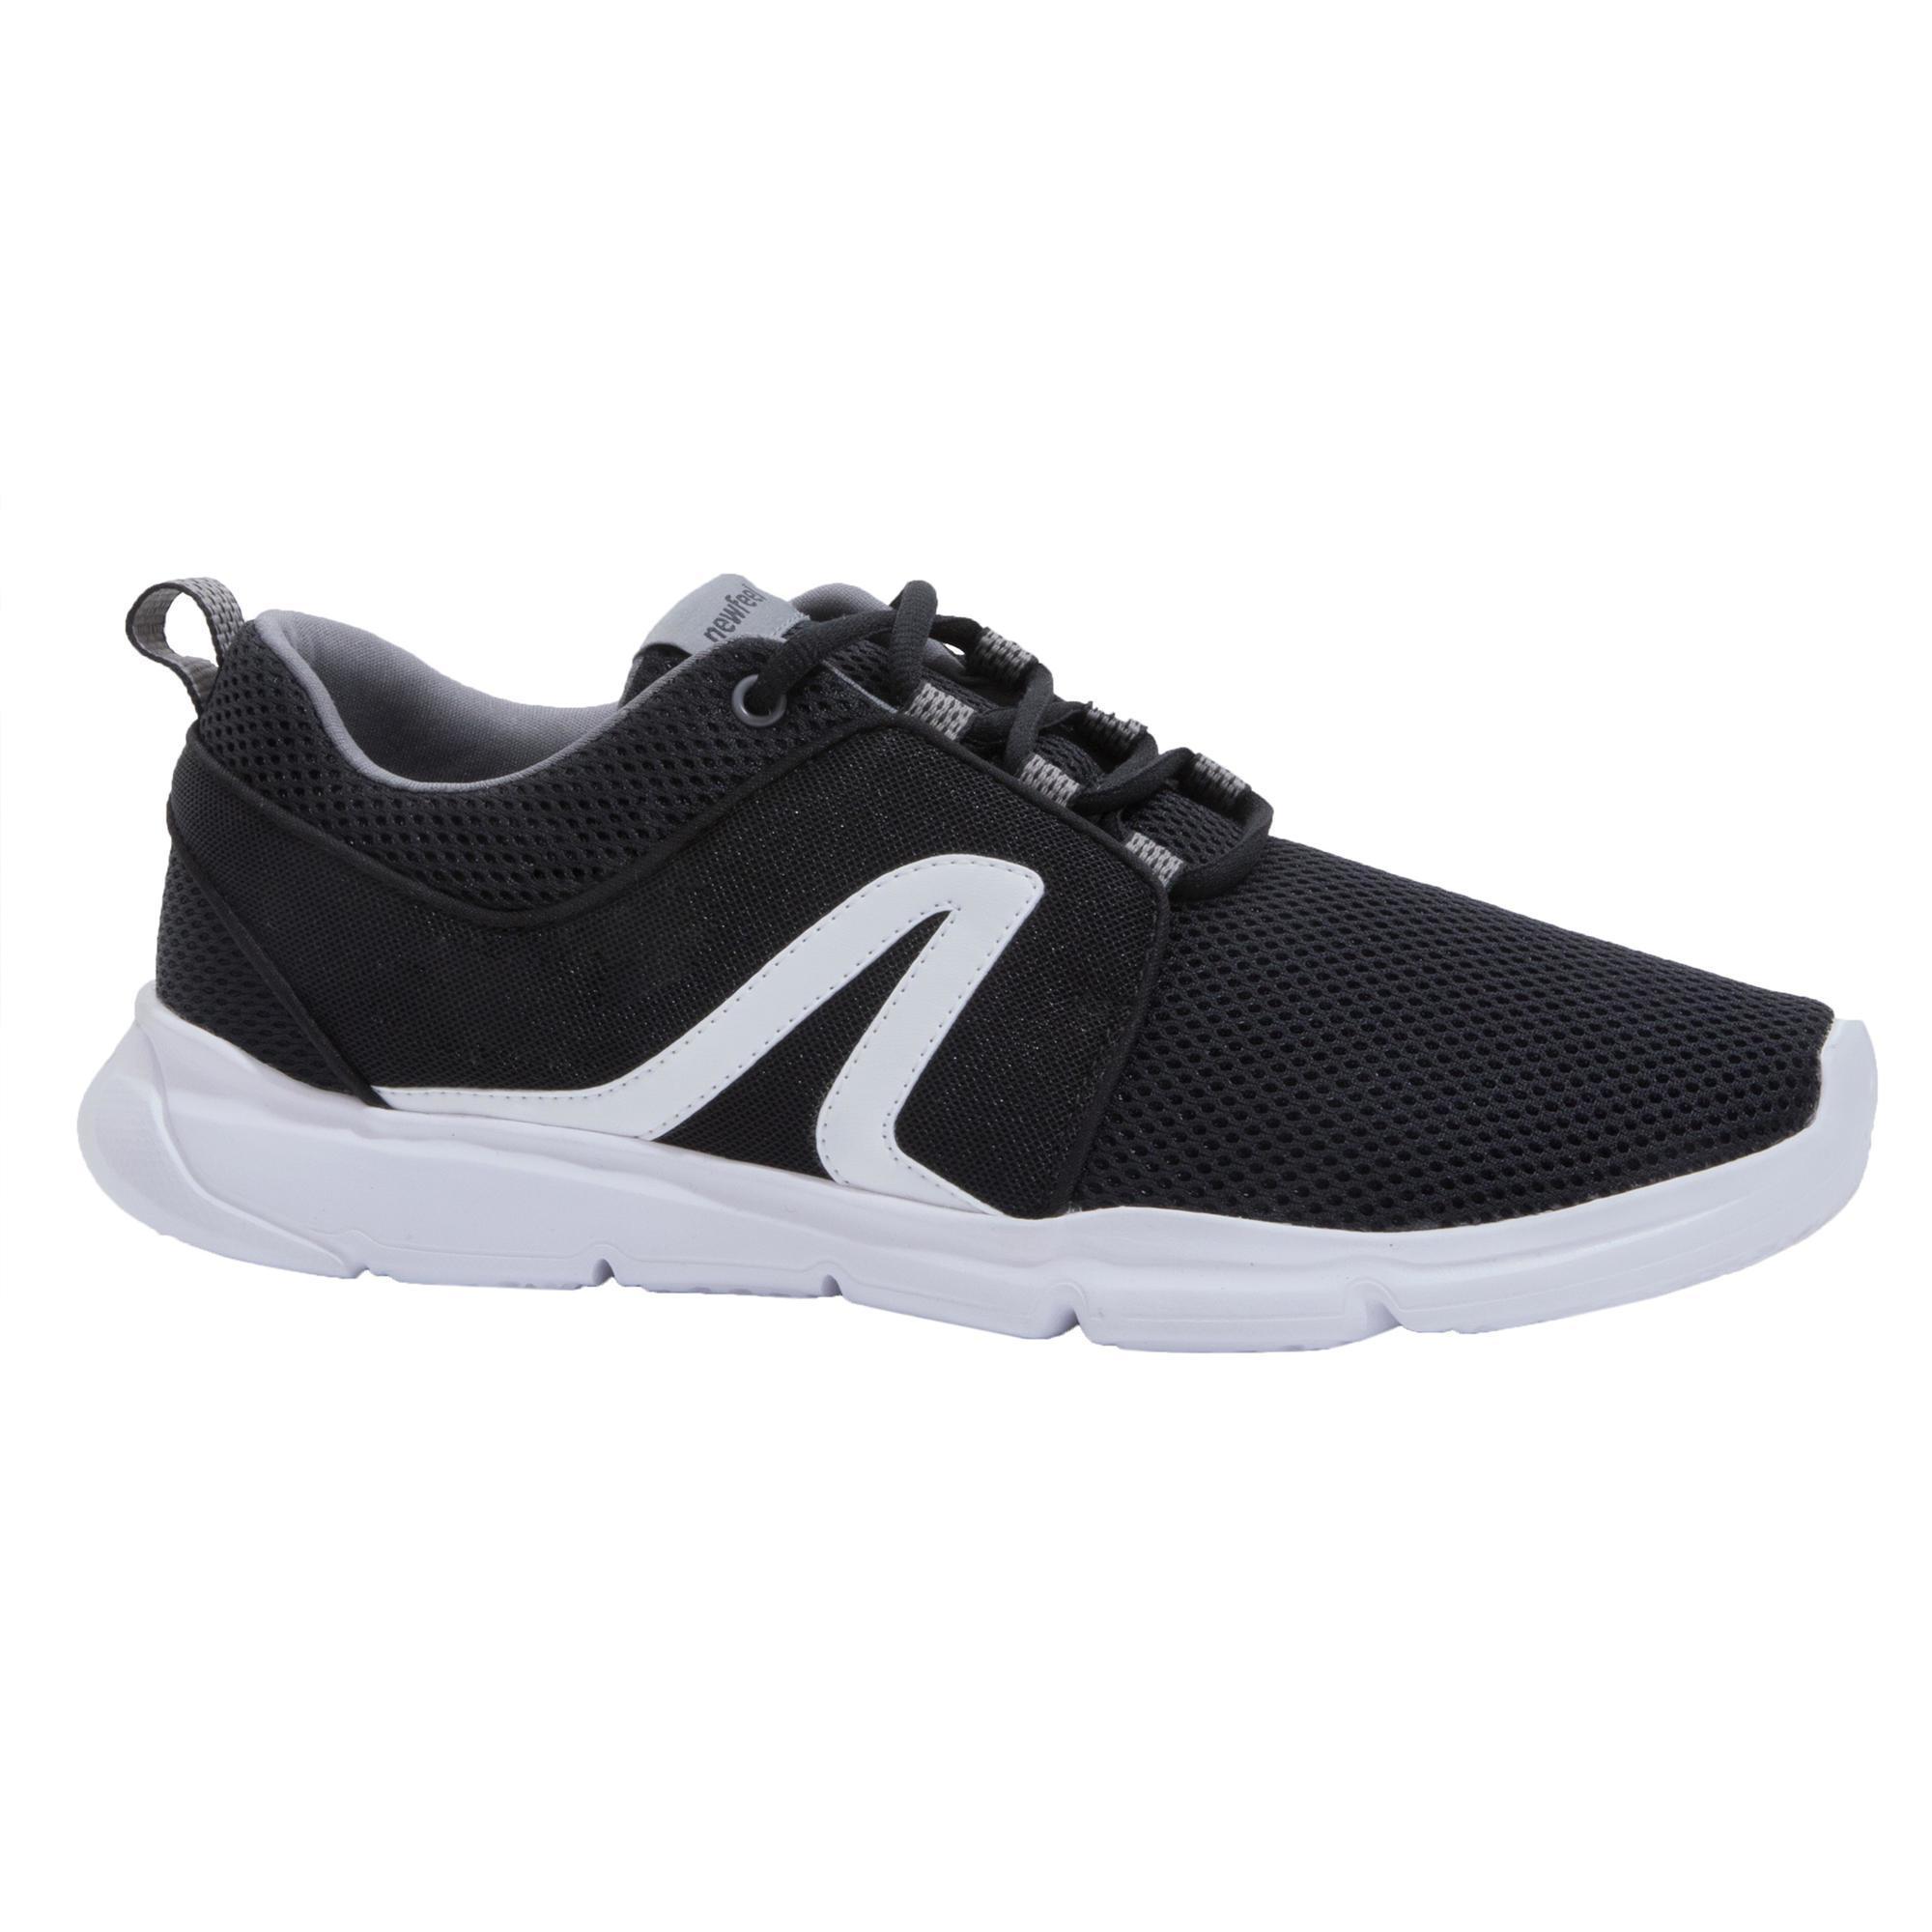 Newfeel Chaussures marche sportive femme PW 120 noir / blanc - Newfeel